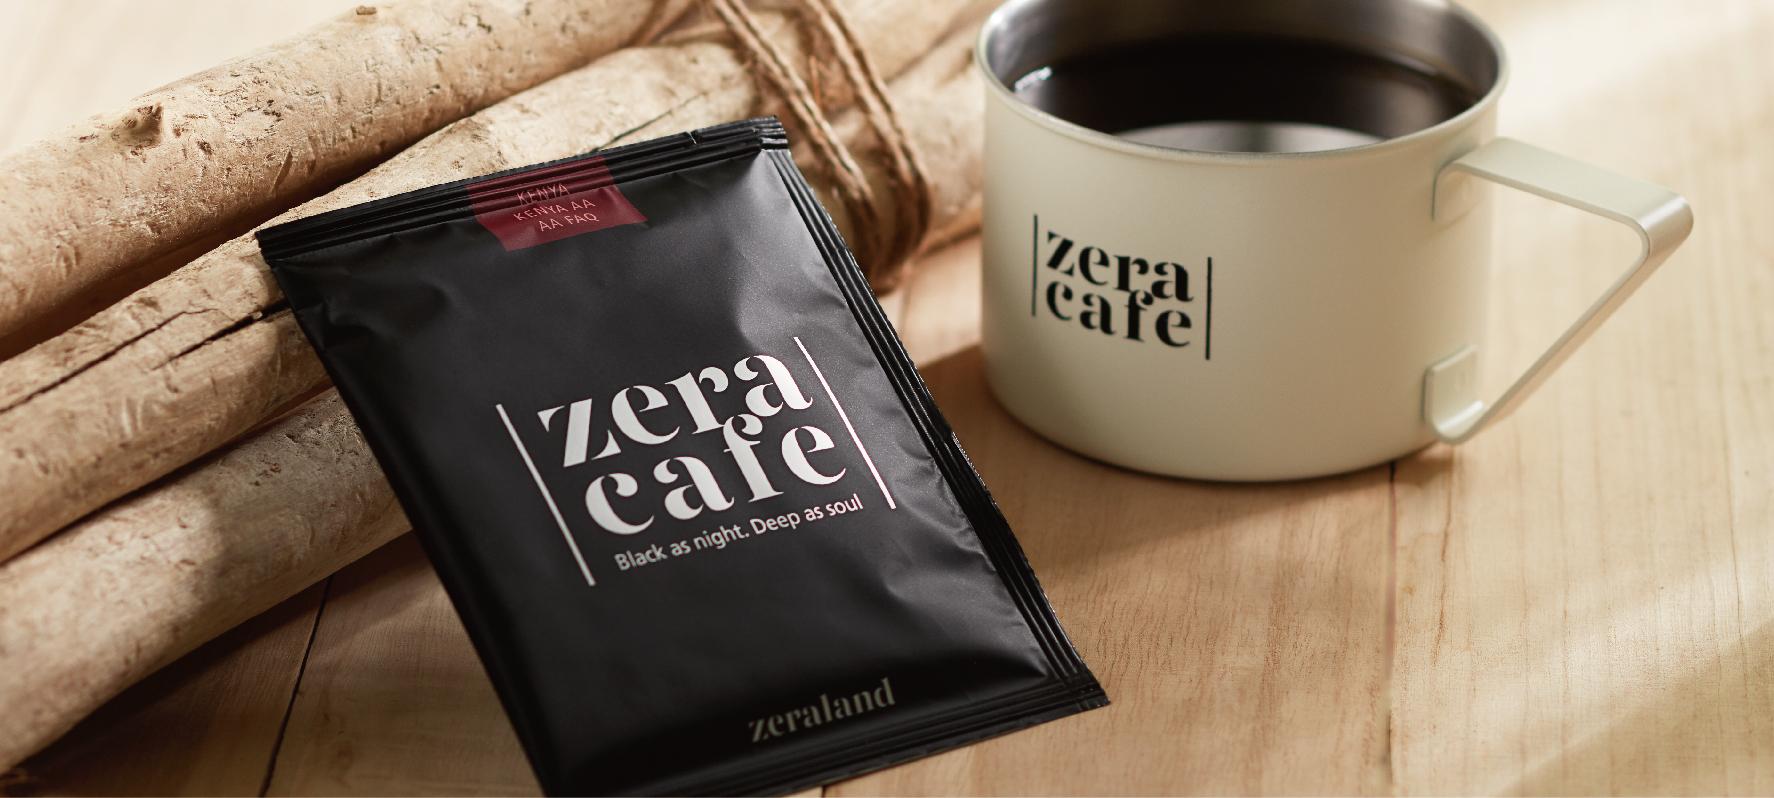 ZeraCafe單品濾掛一包,與裝滿咖啡的杯子